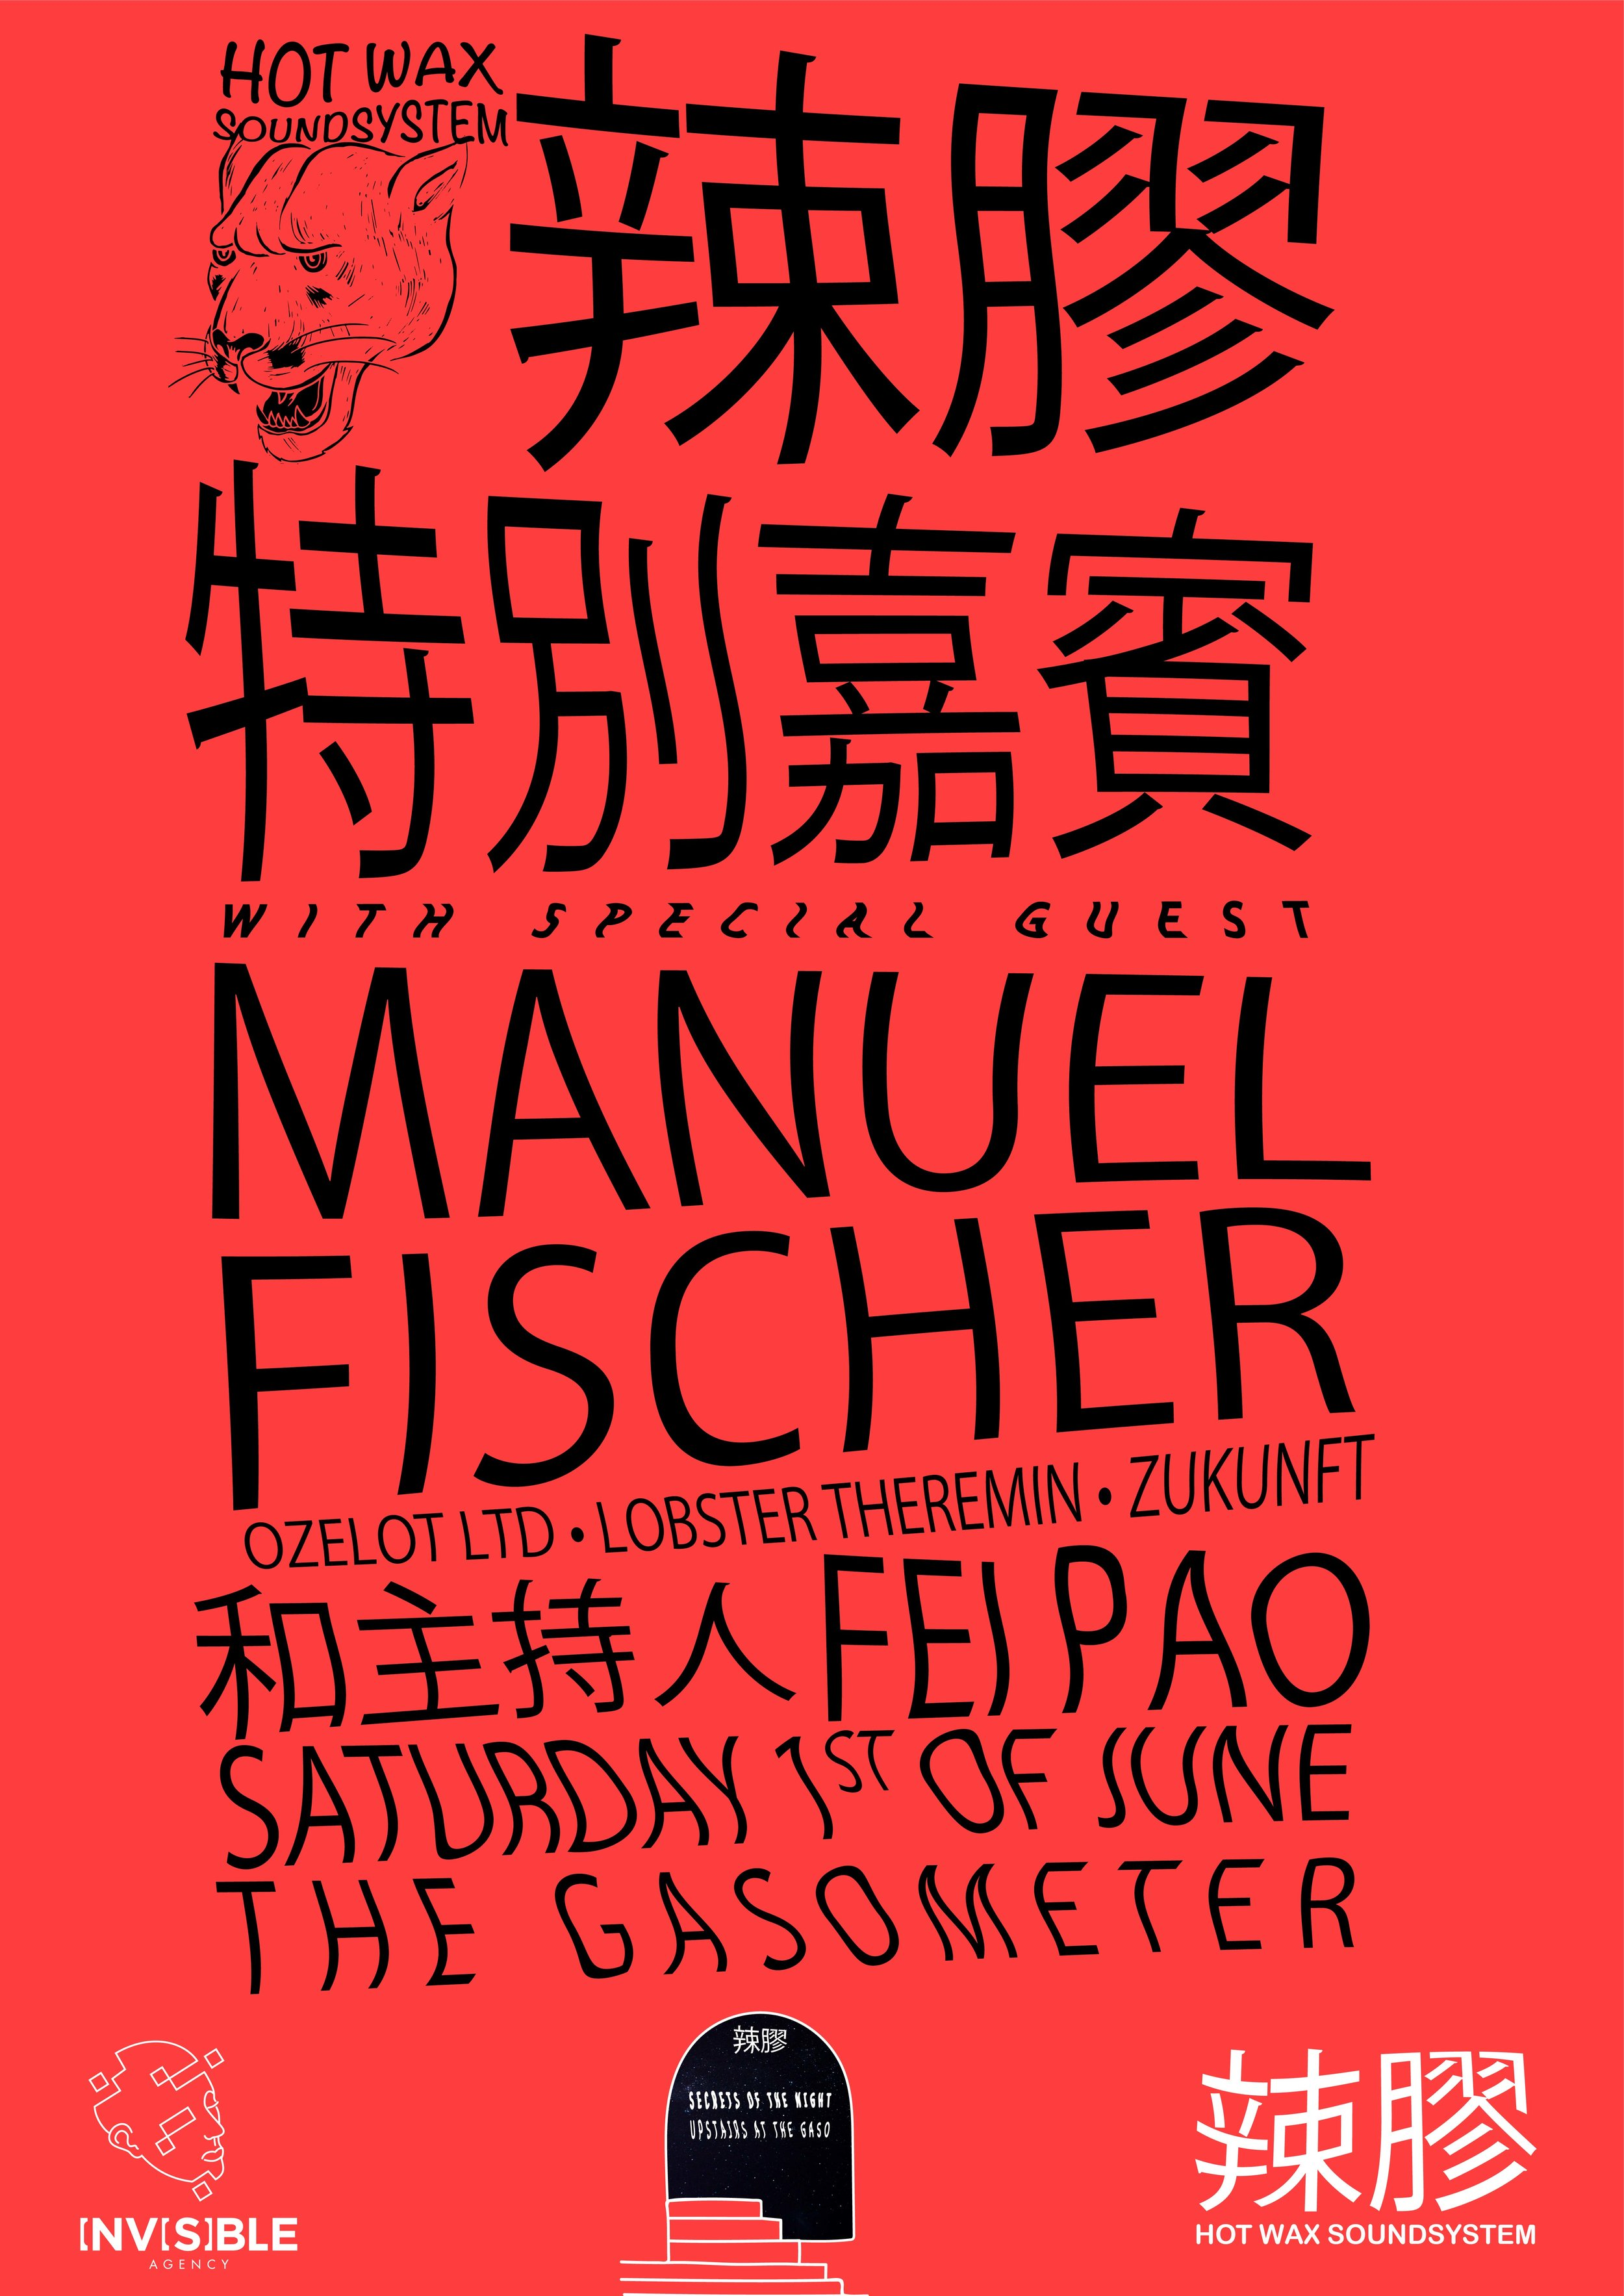 Secrets Of The night - Manuel Fischer - Gaso-Poster.jpg